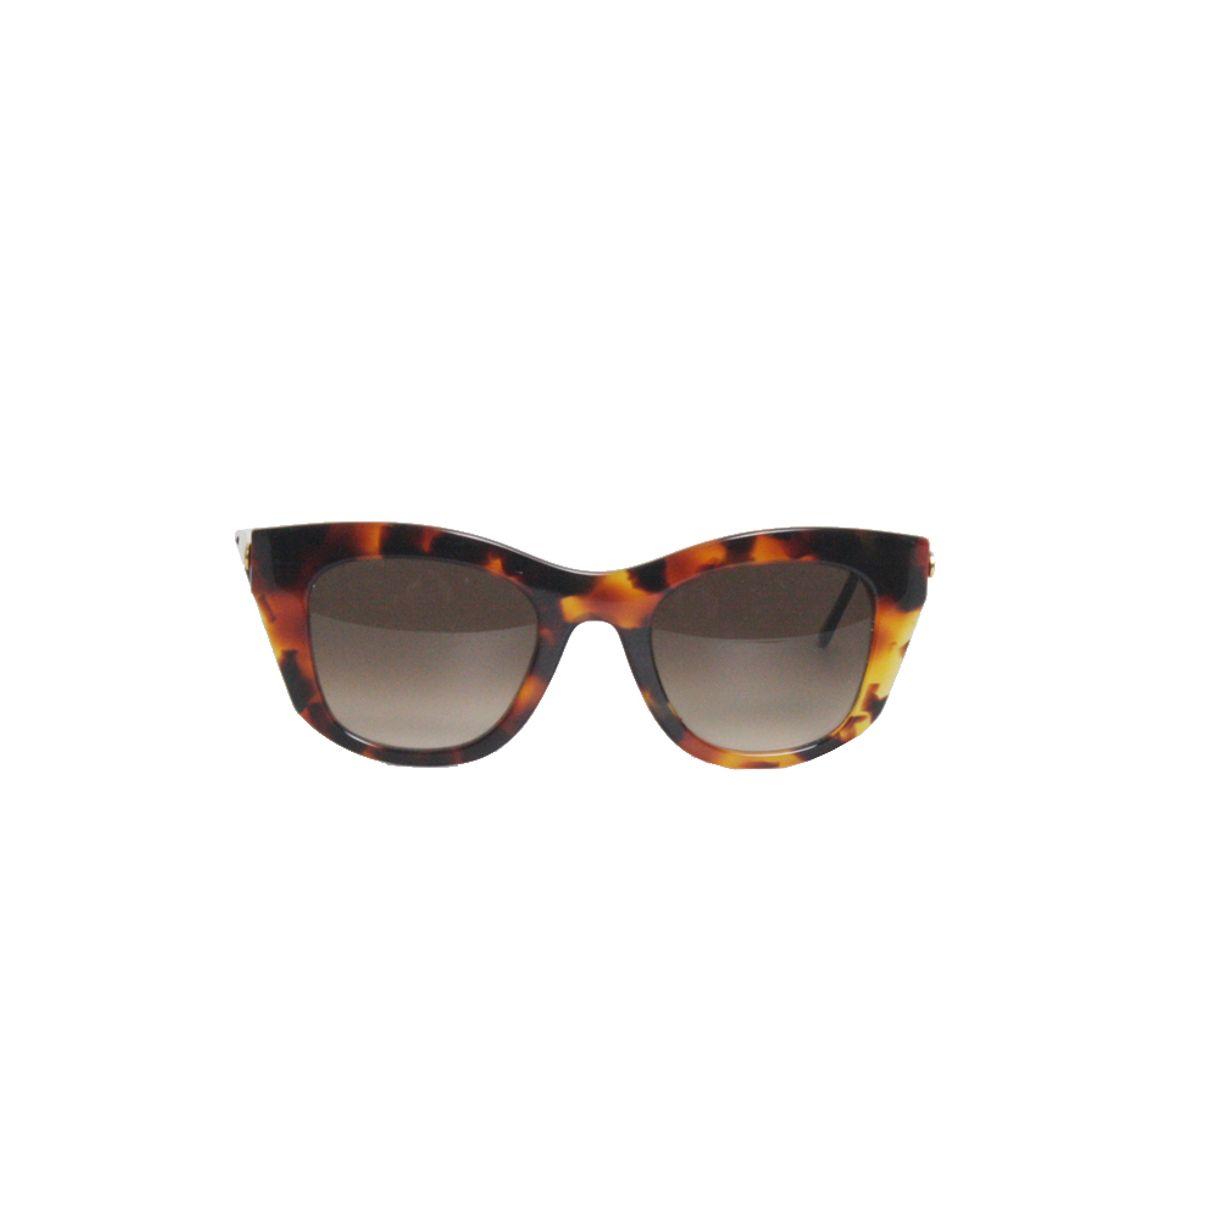 Oculos-Thierry-Lasry-Supremacy-Tartaruga-e-Laranja